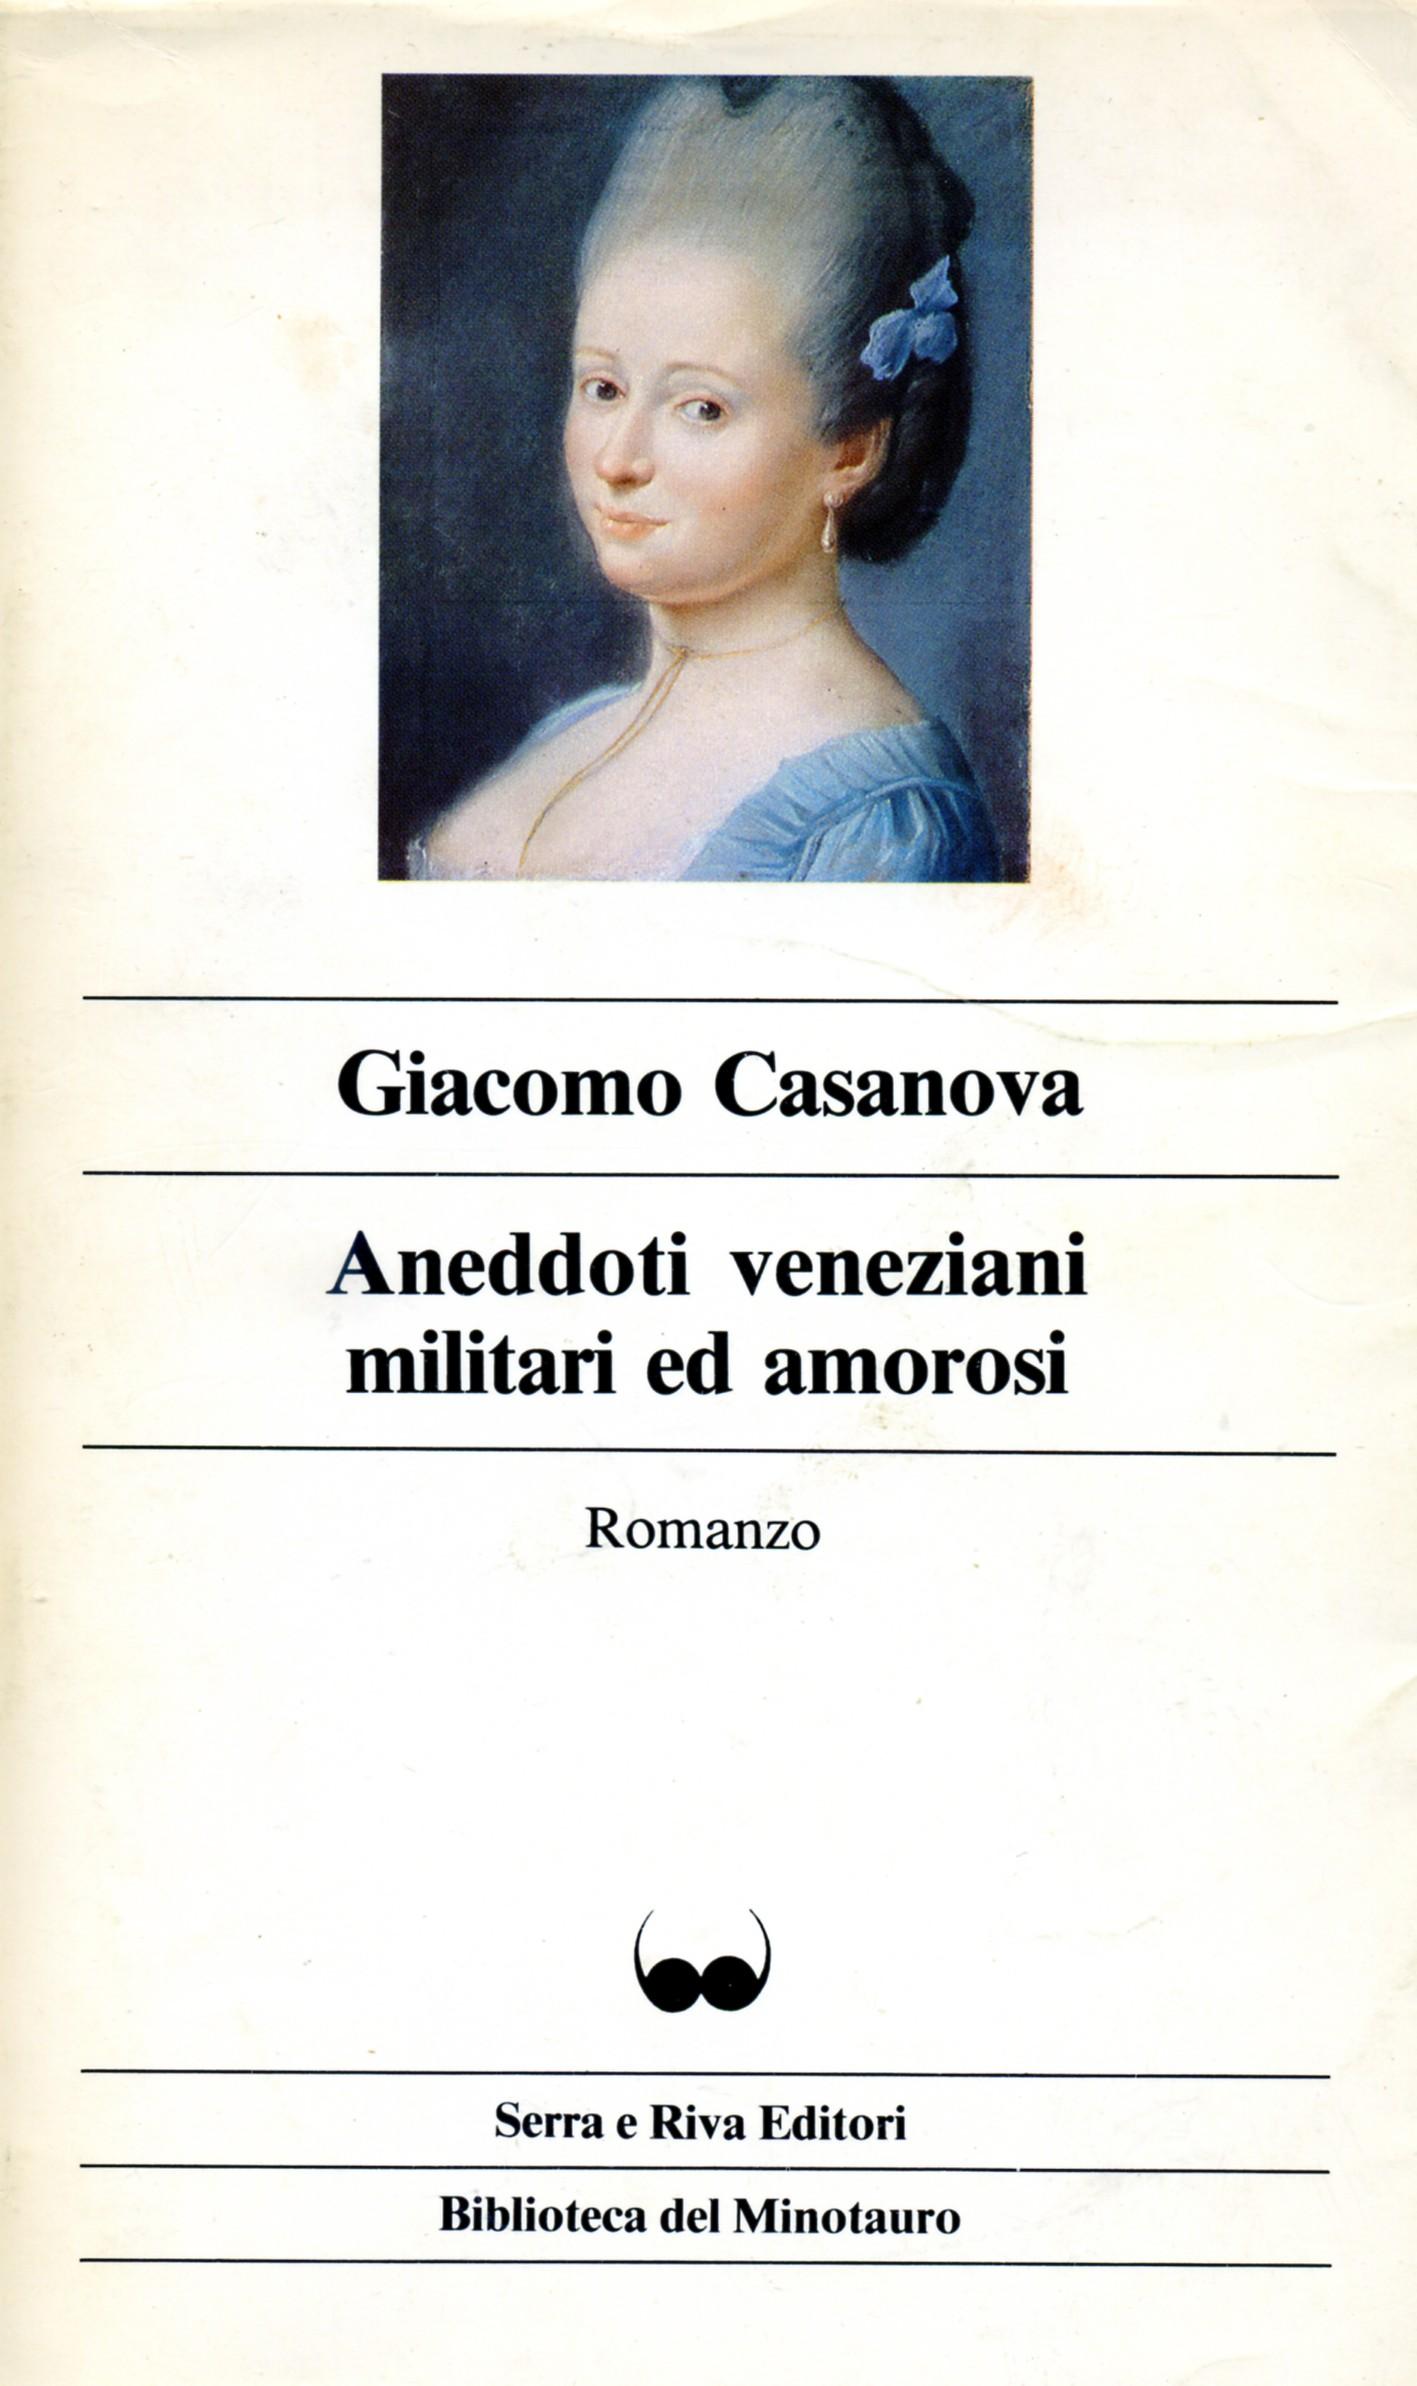 Aneddoti veneziani m...